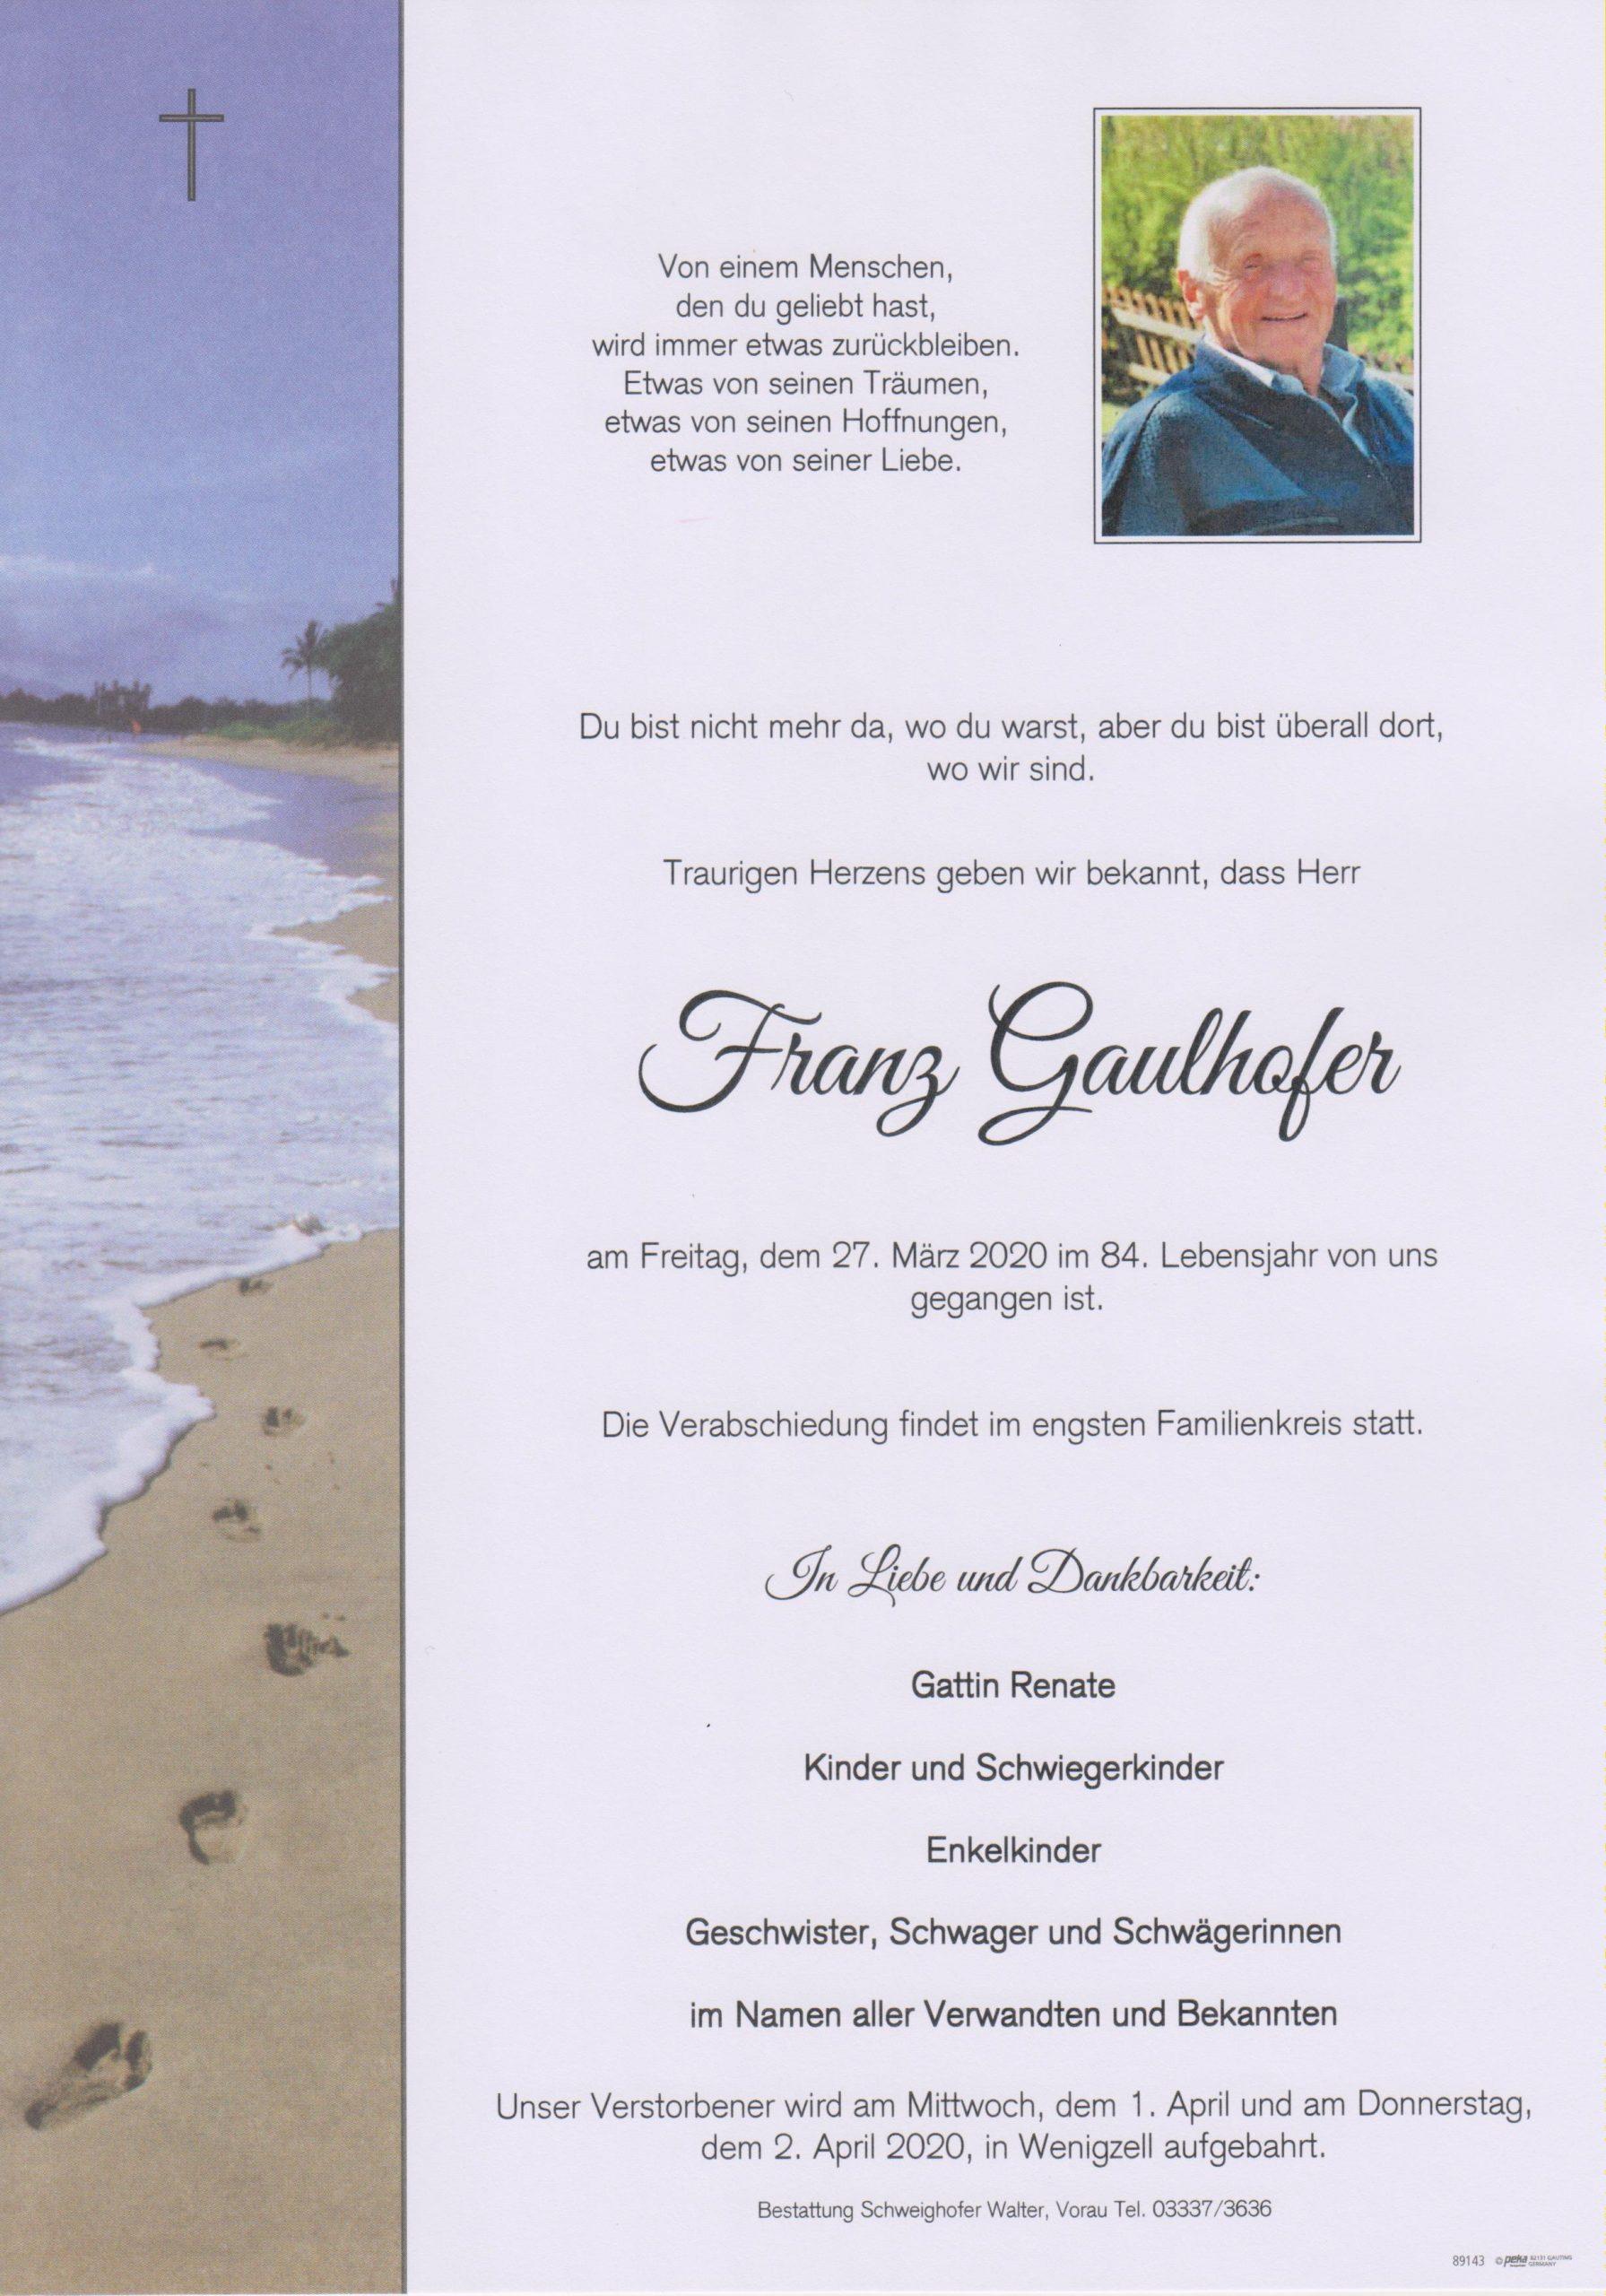 Franz Gaulhofer